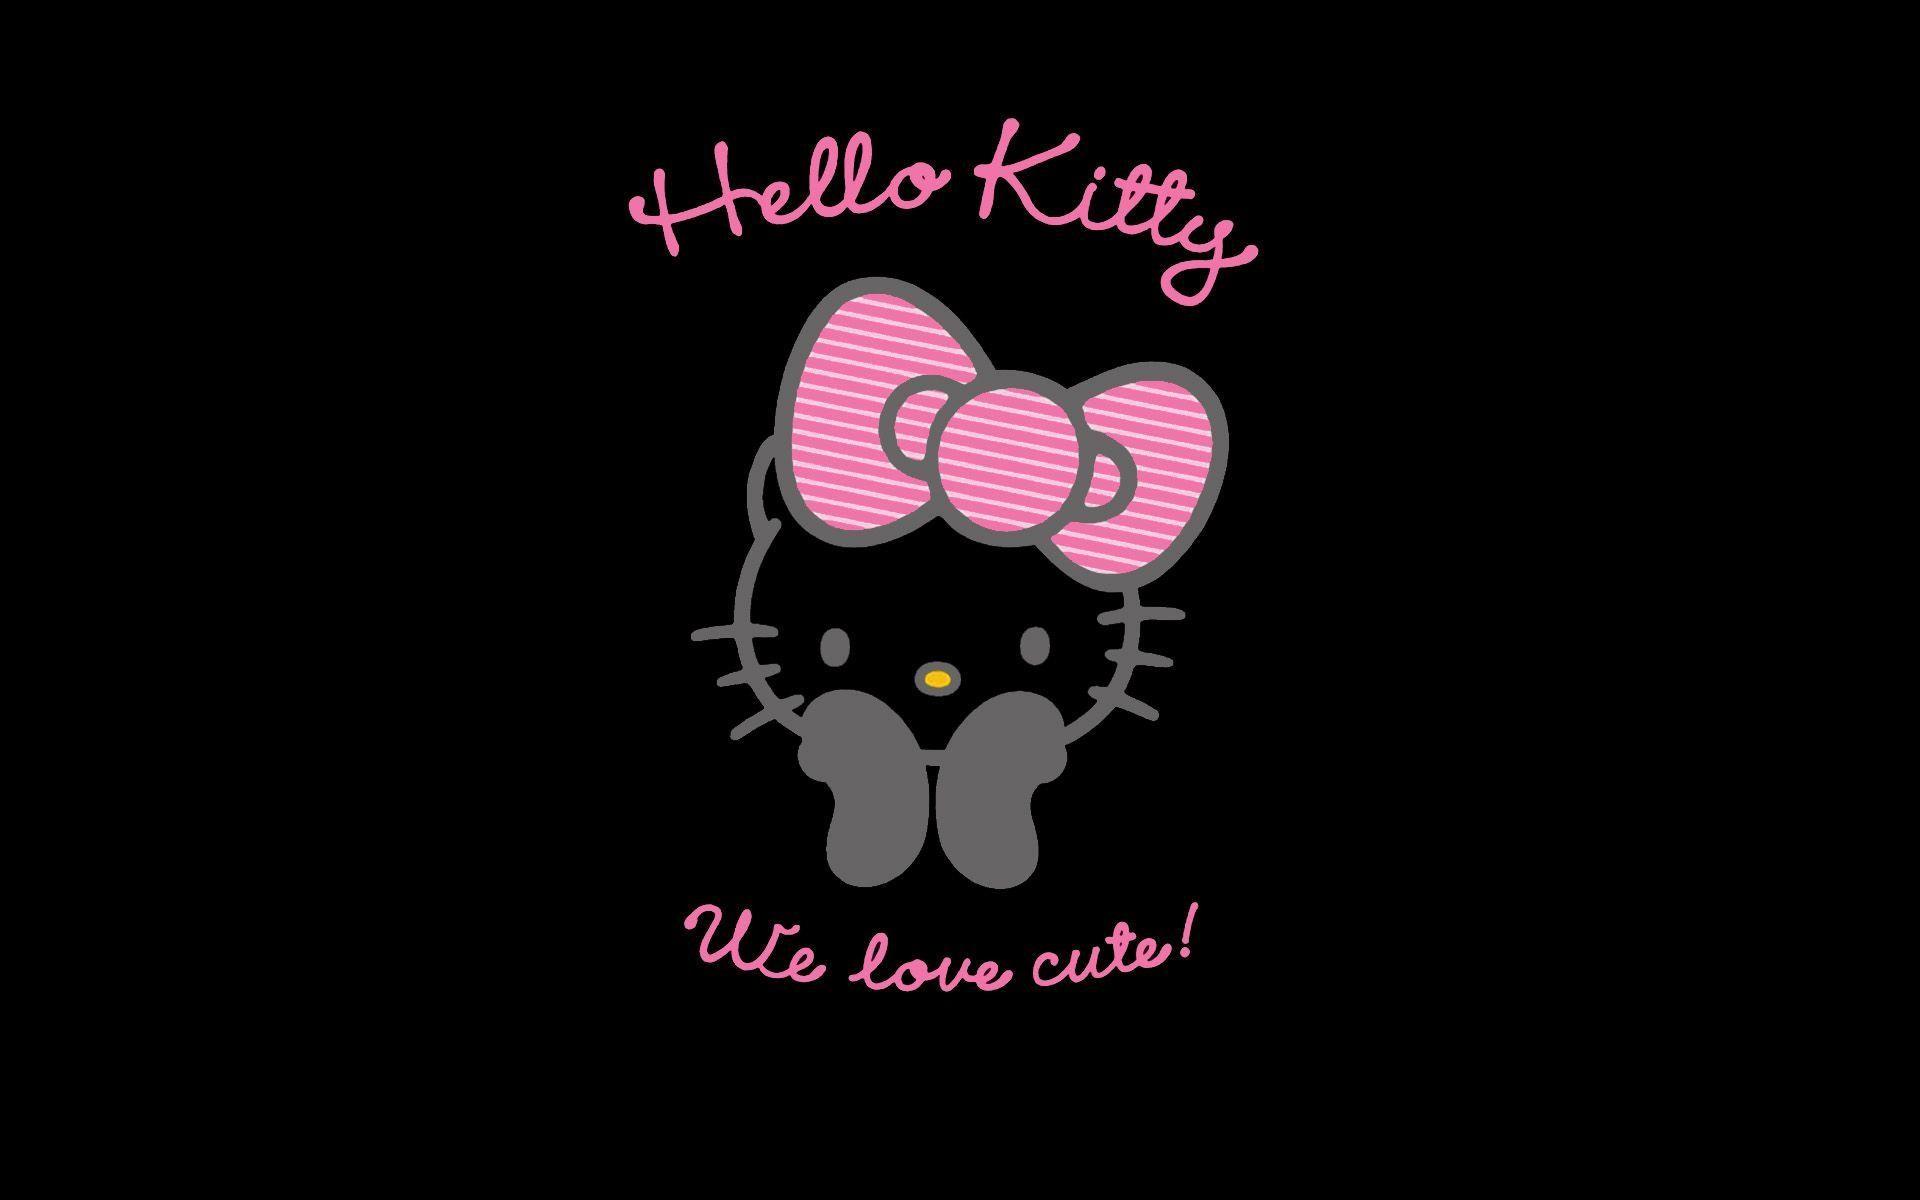 Hello Kitty Wallpapers – HD Wallpapers Inn